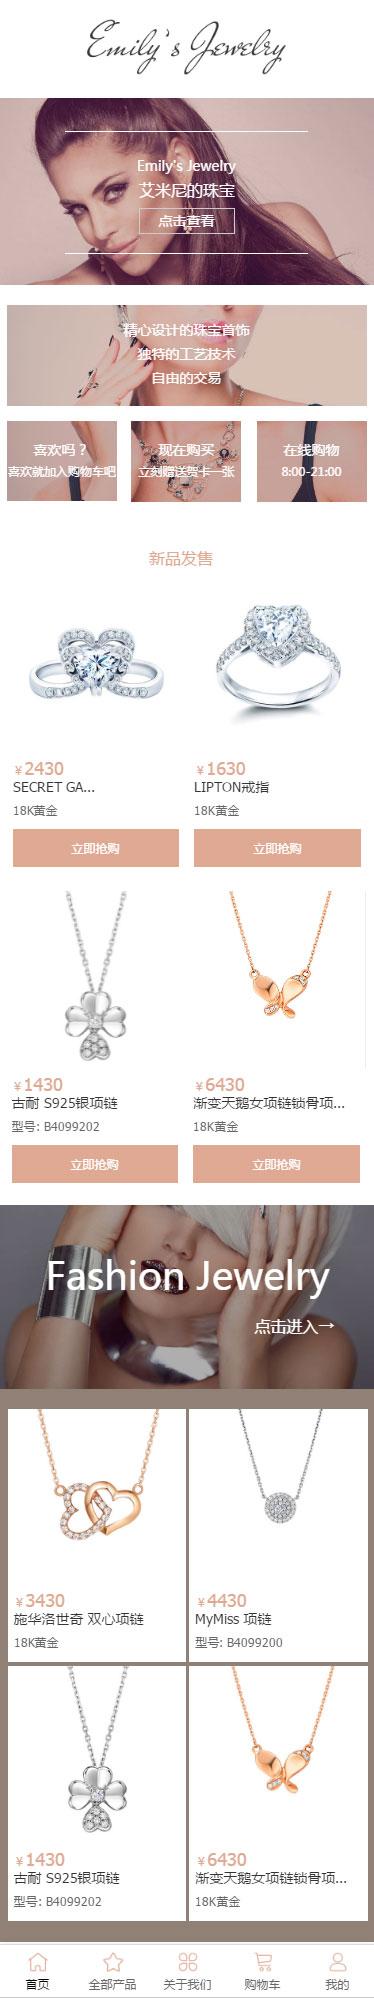 Emily Jewelry珠宝商城小程序模板